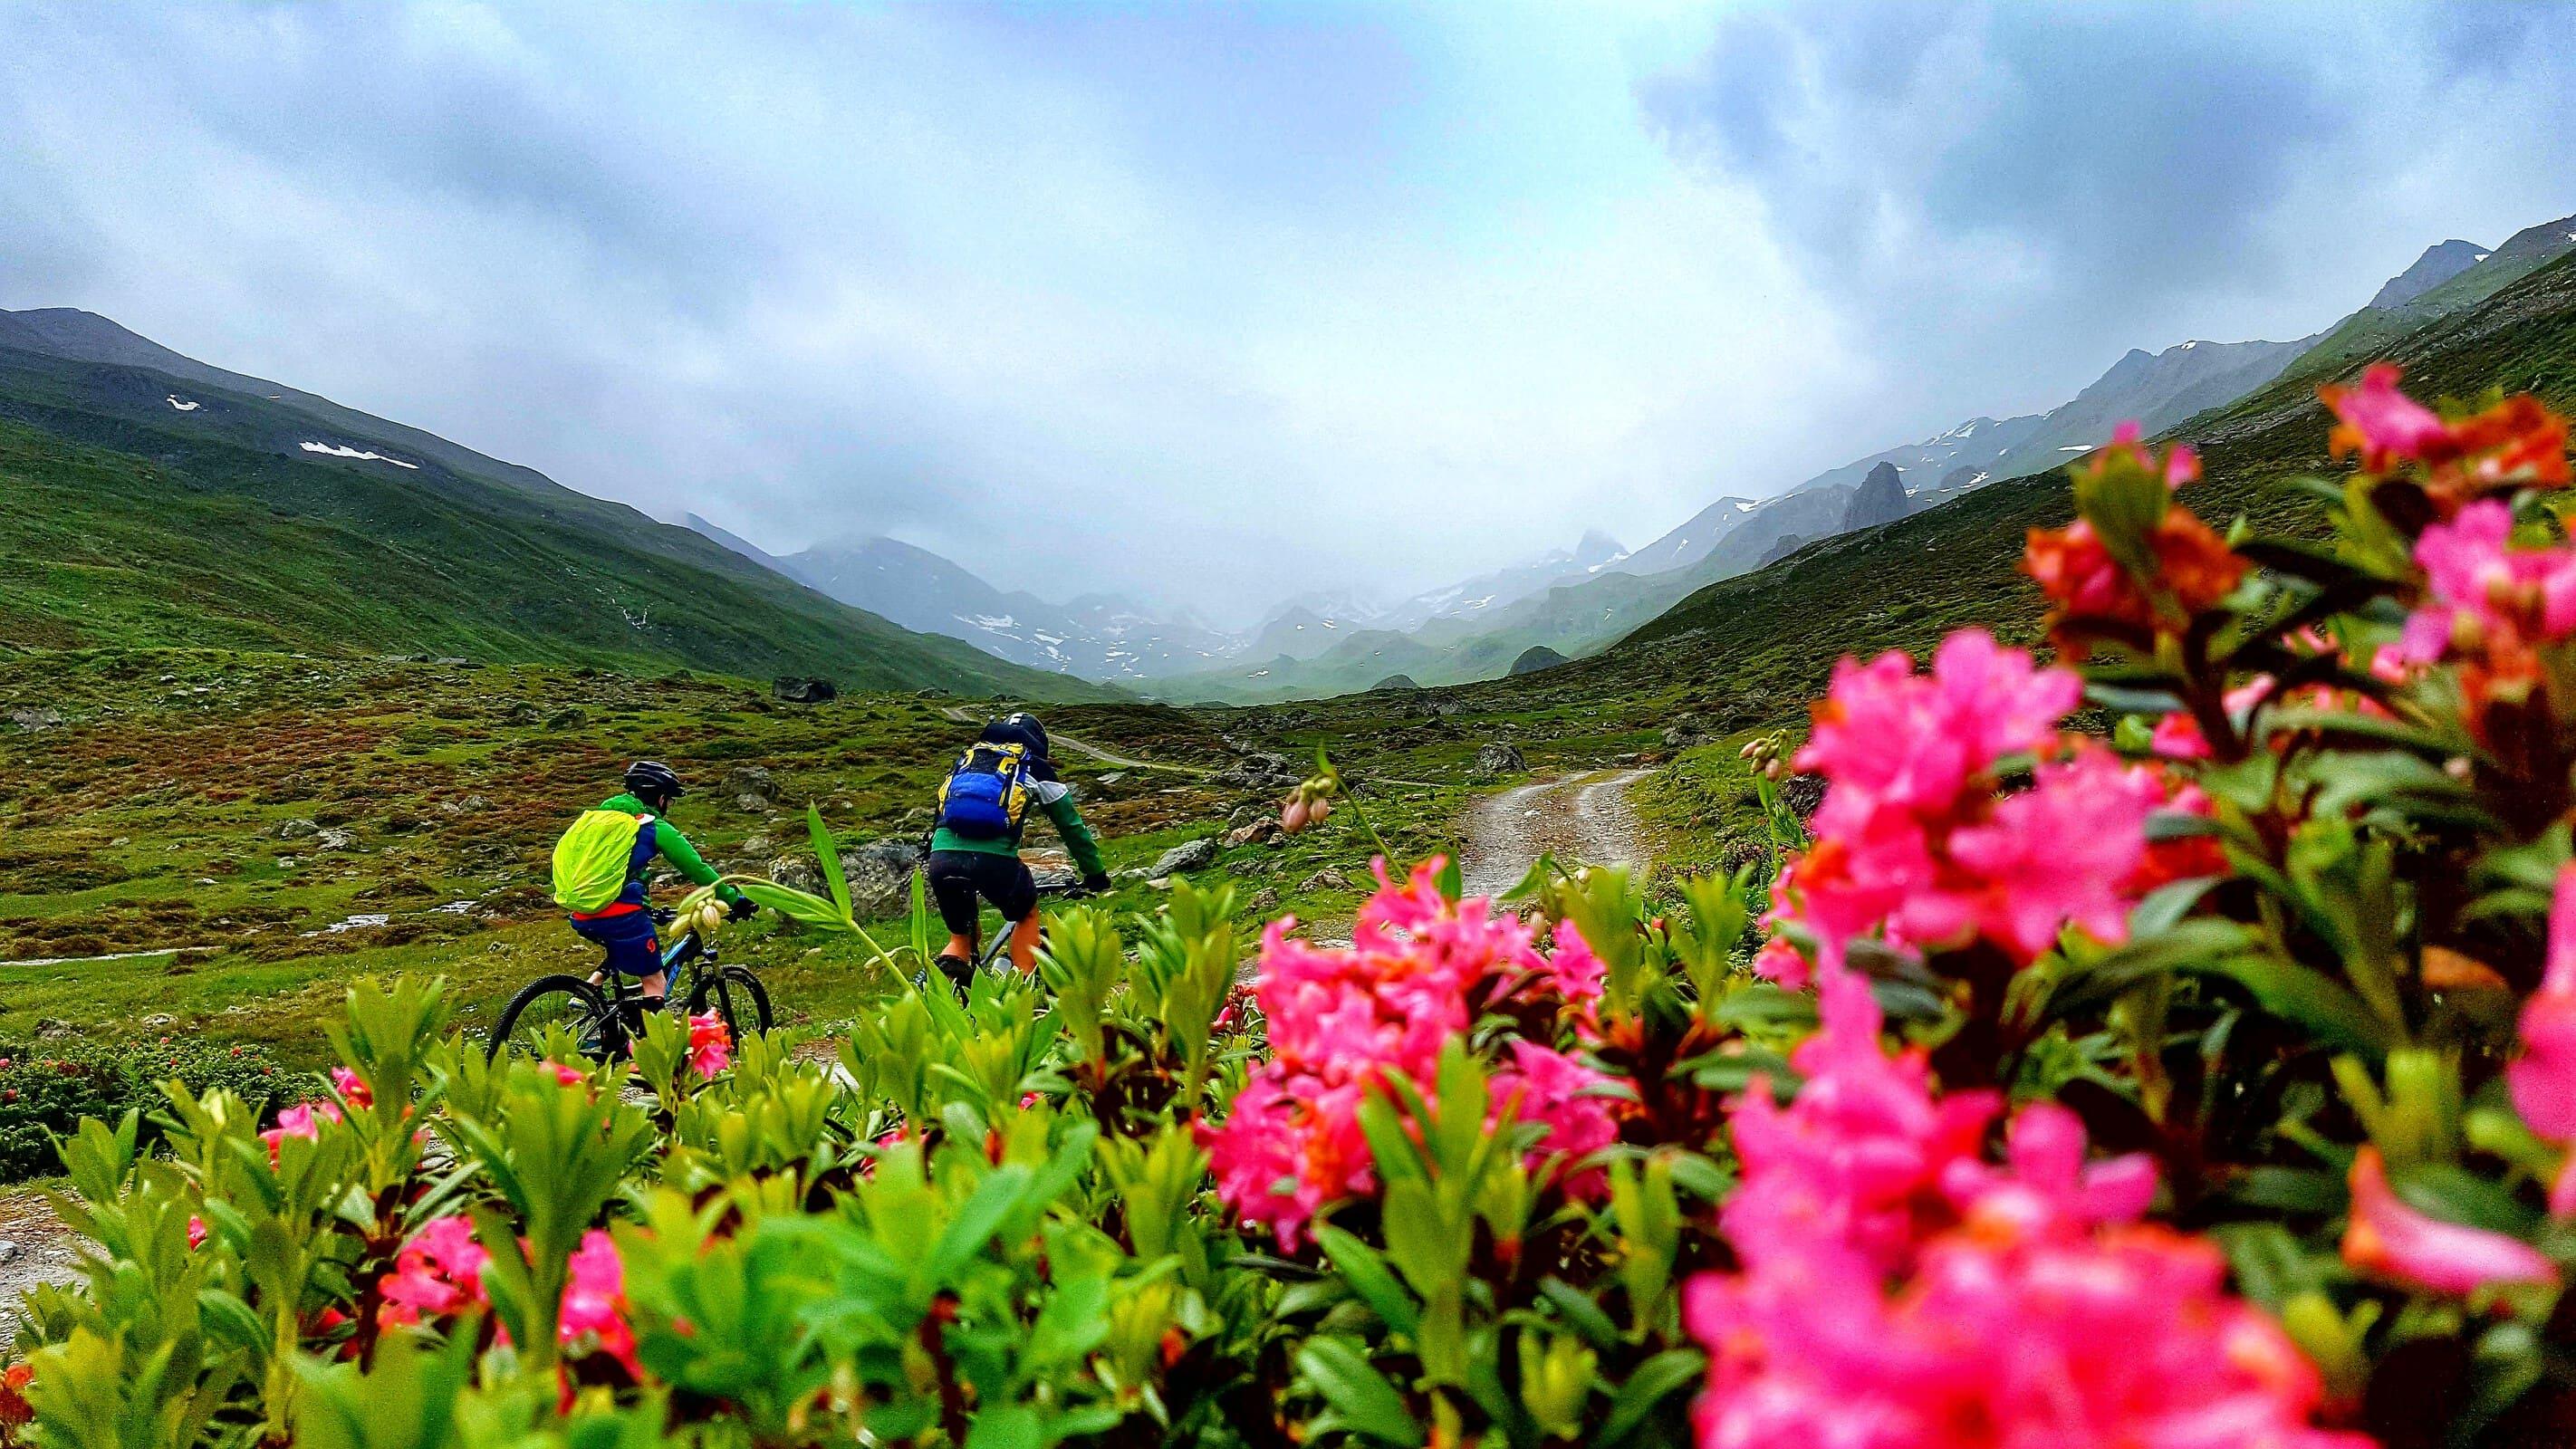 Mountain biking in Tirol